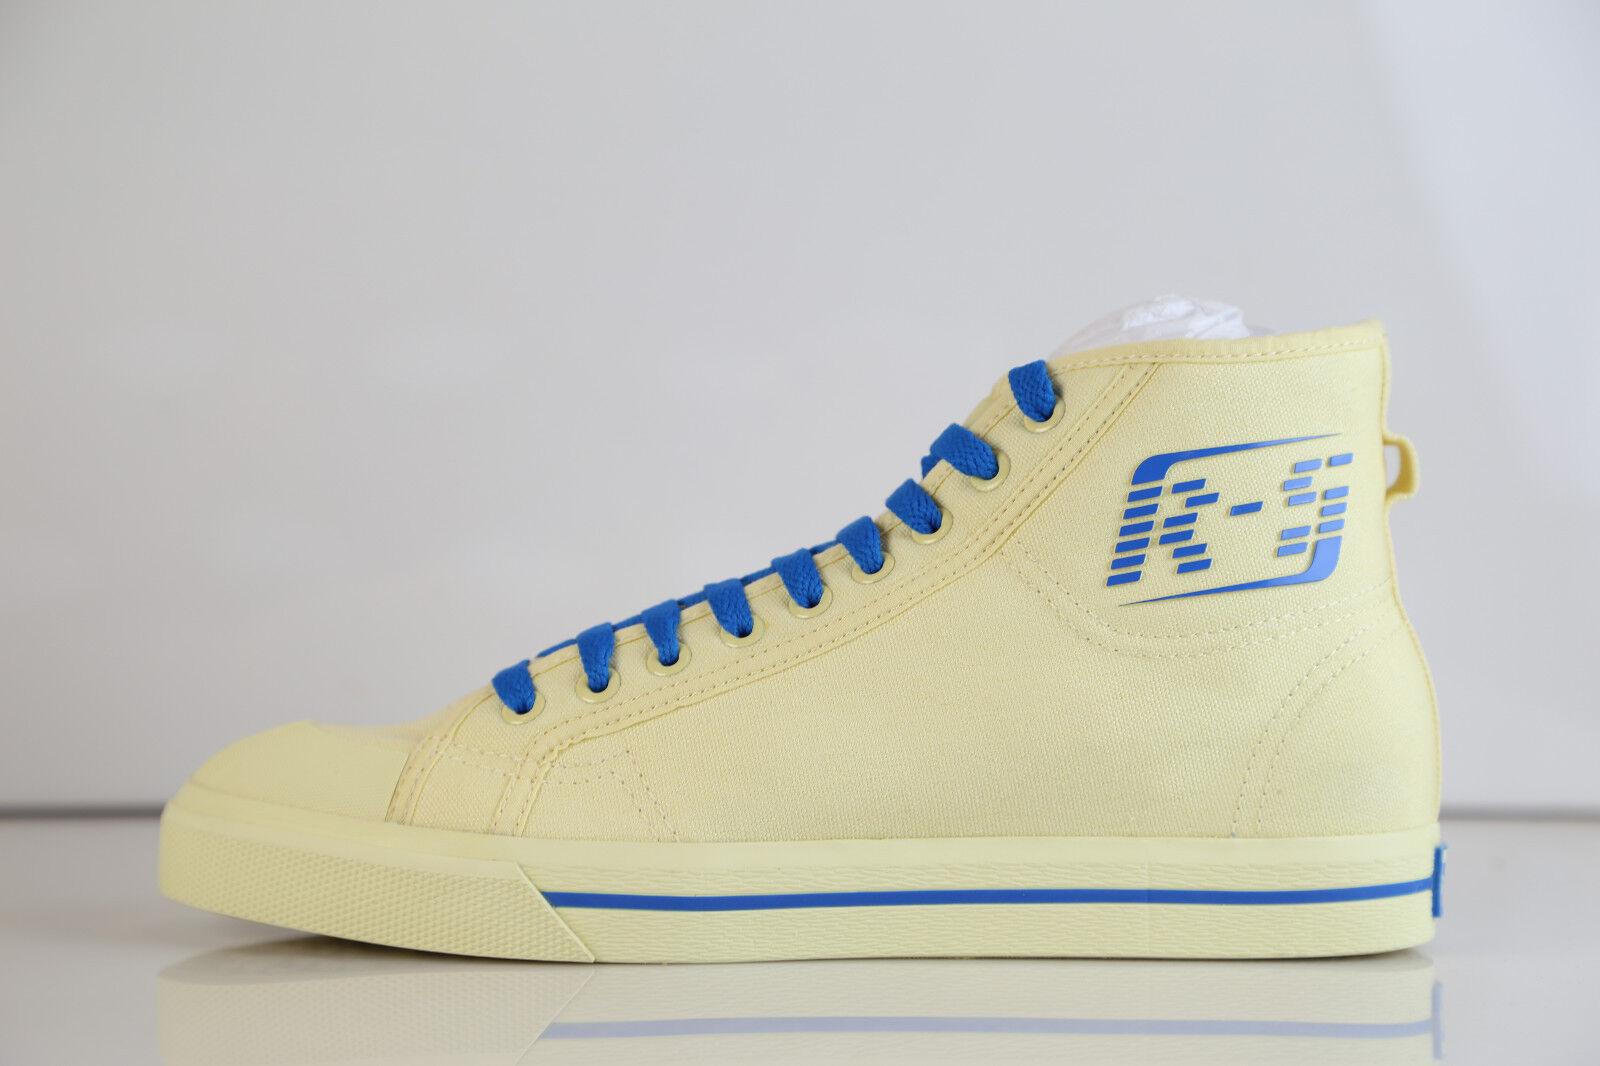 Adidas Raf Simons Matrix Spirit Hi Egg Mission bluee BB2690  8-12 stan boost